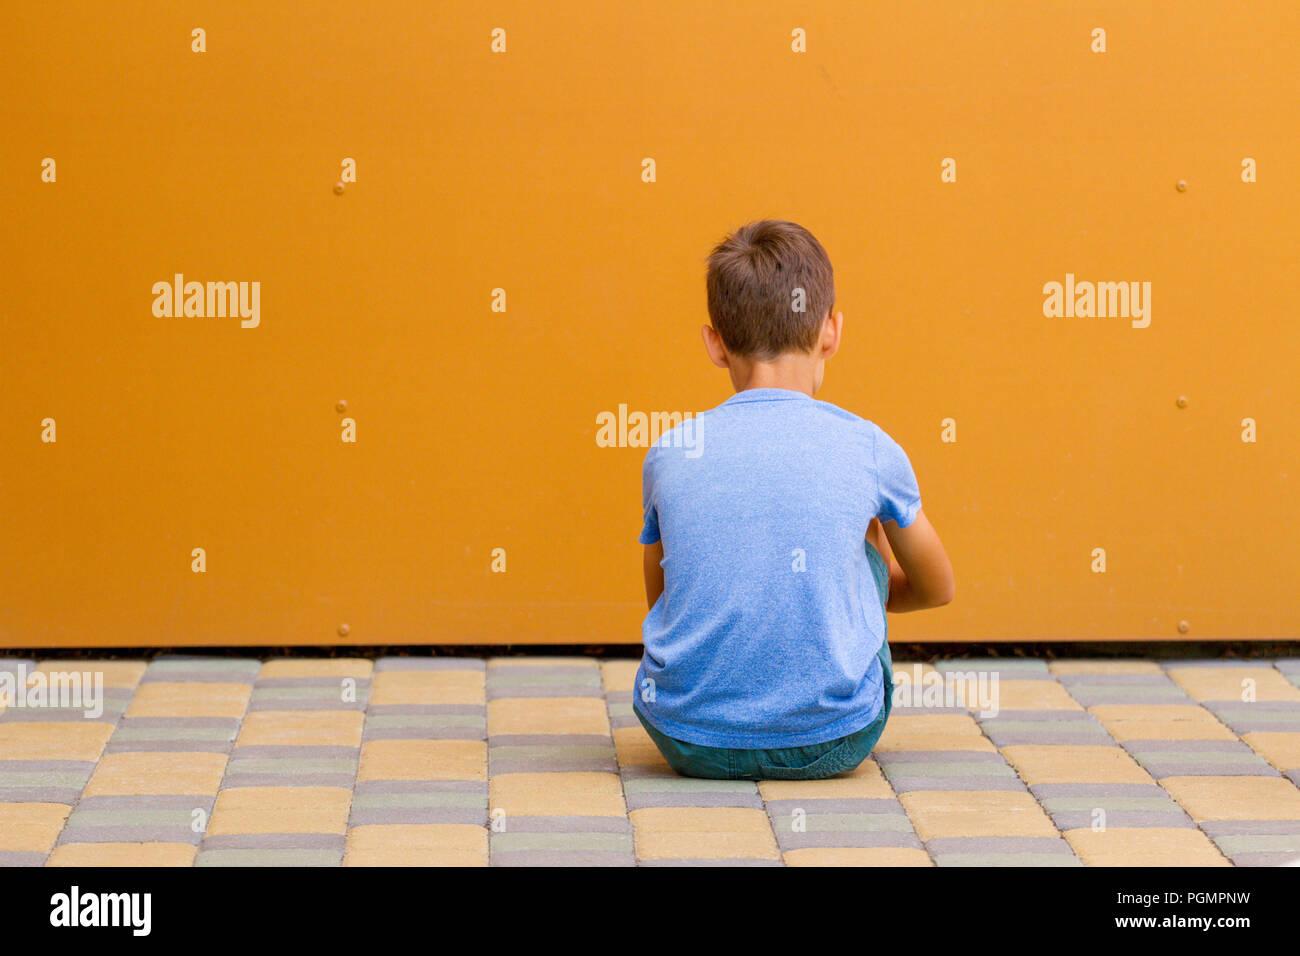 Sad alone boy sitting near colorful wall outdoors. - Stock Image